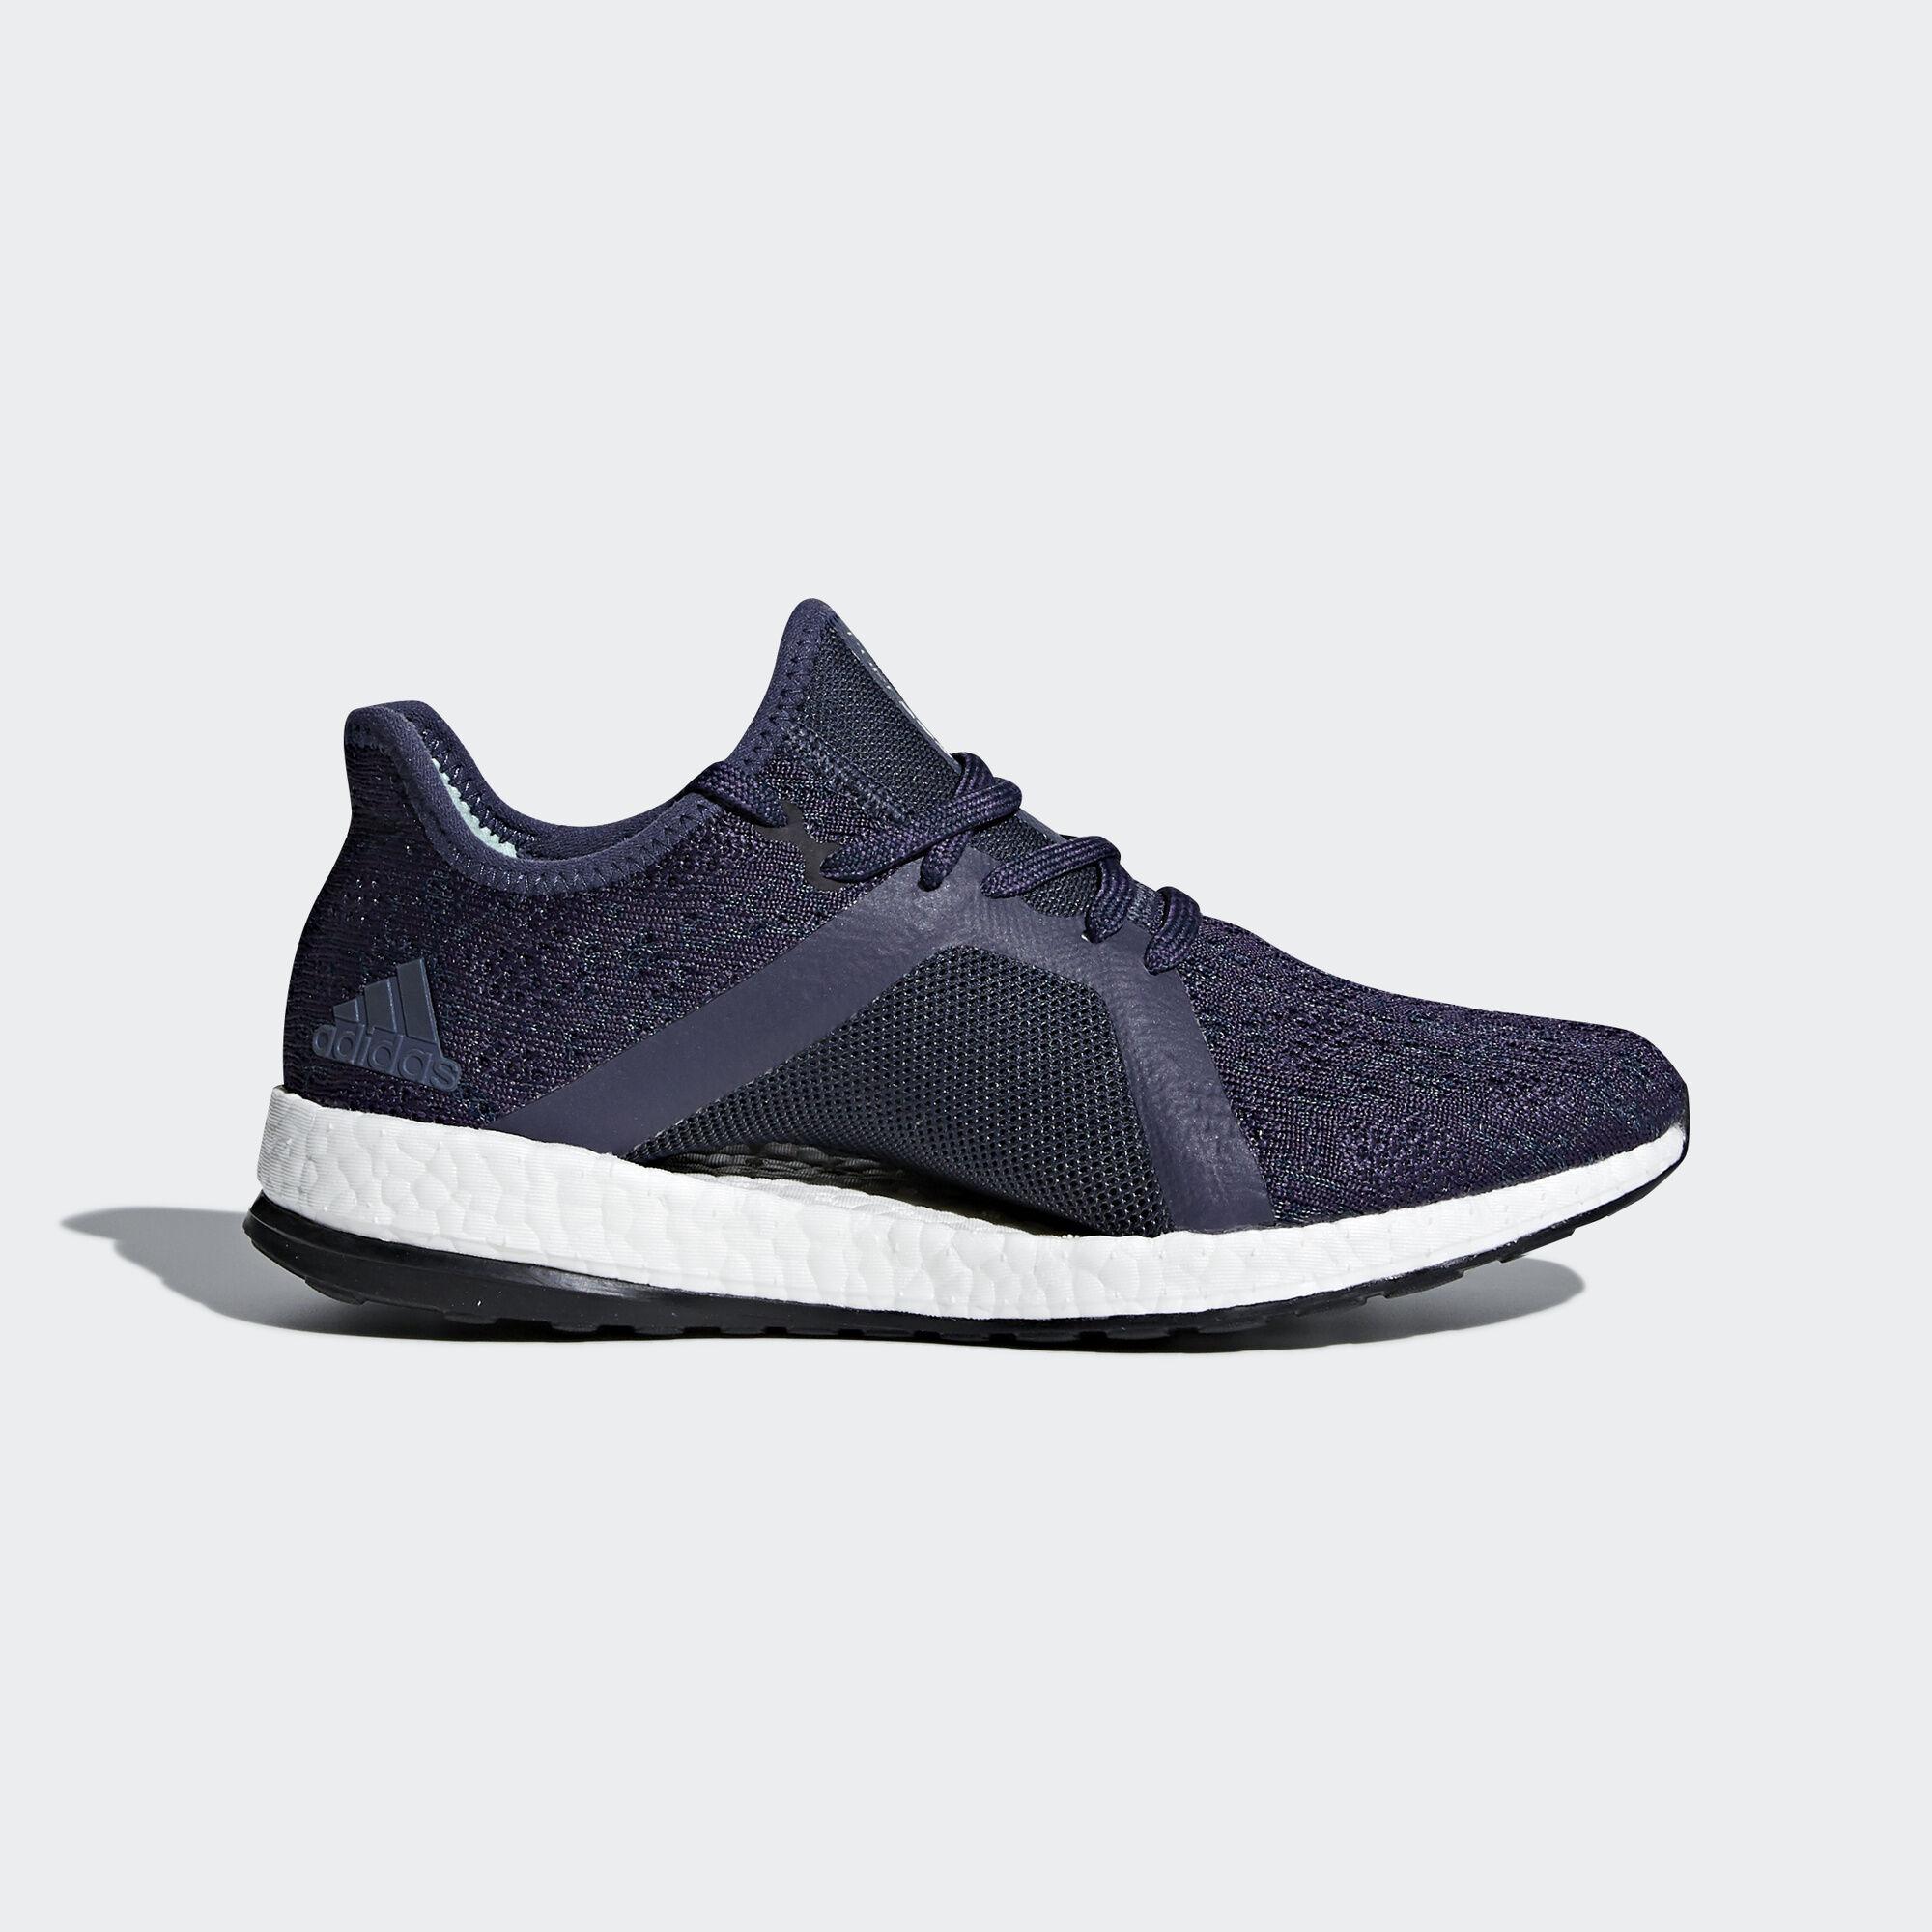 Zapatillas running Adidas Pureboost X Elemment  Rosa (Old Rose Struc 556) Tamaris 24632 New Balance 420  Color Azul DeYxLQRfn